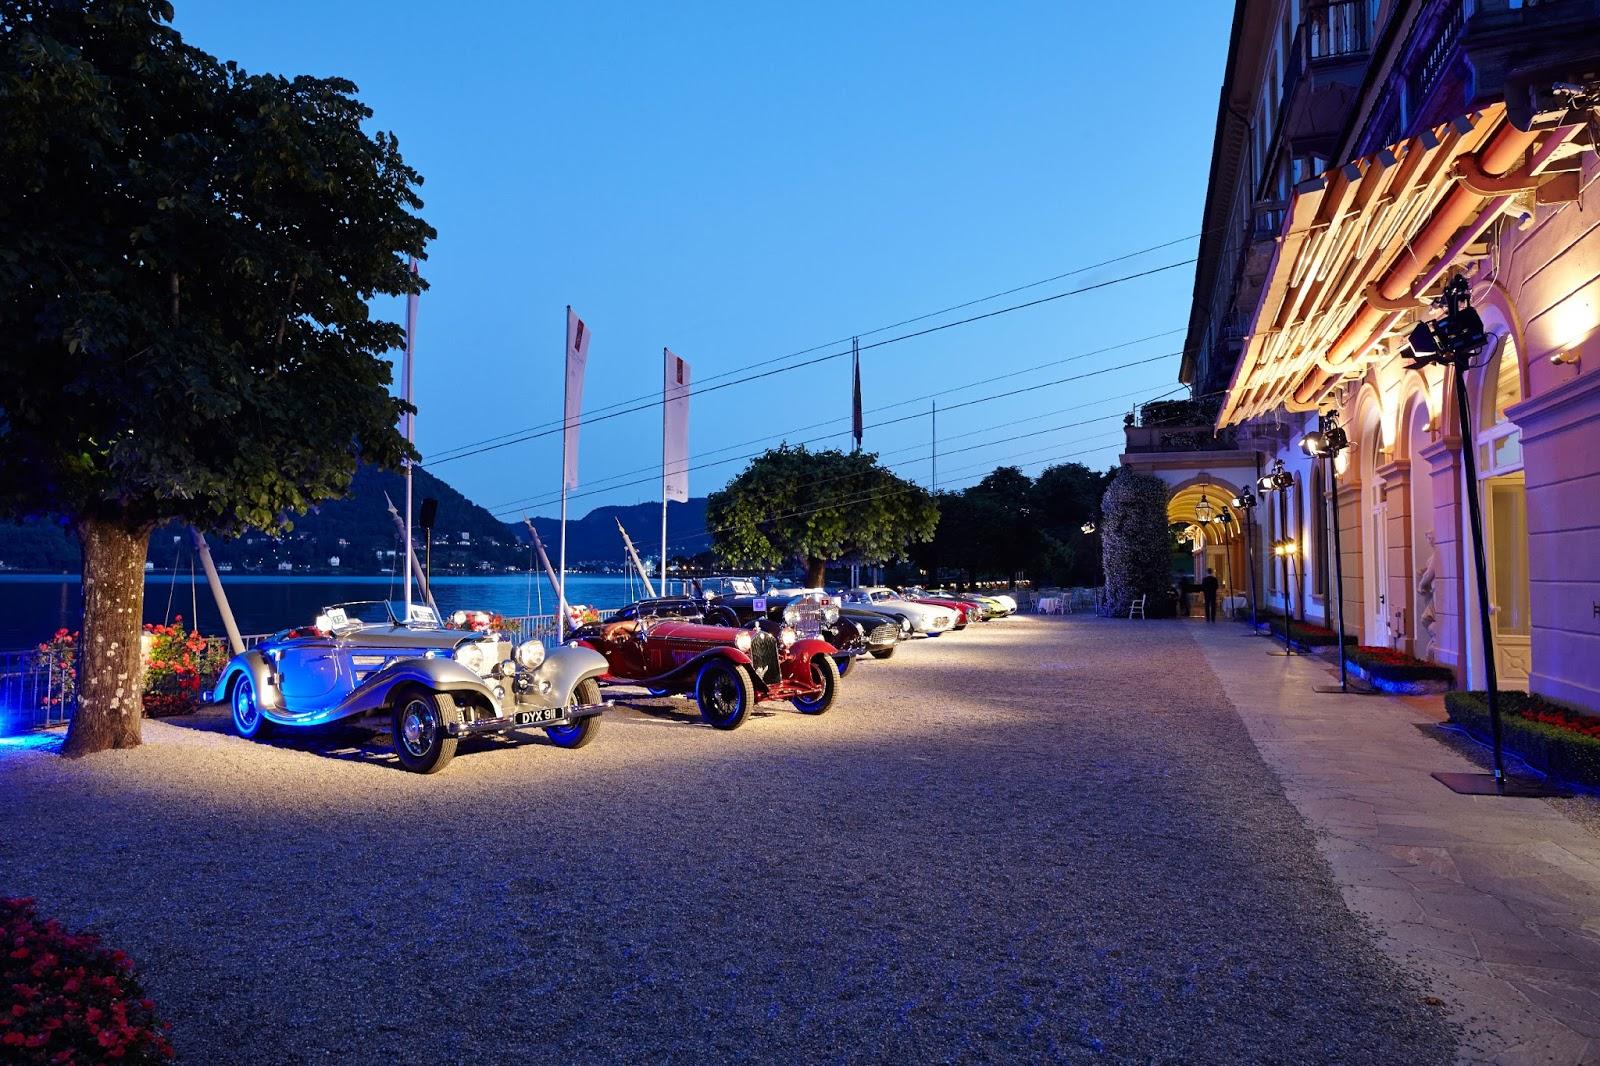 concorso deleganza v Καλλιστεία για ιστορικά αυτοκίνητα και κορυφαίες μοτοσυκλέτες στις όχθες της λίμνης Κόμο